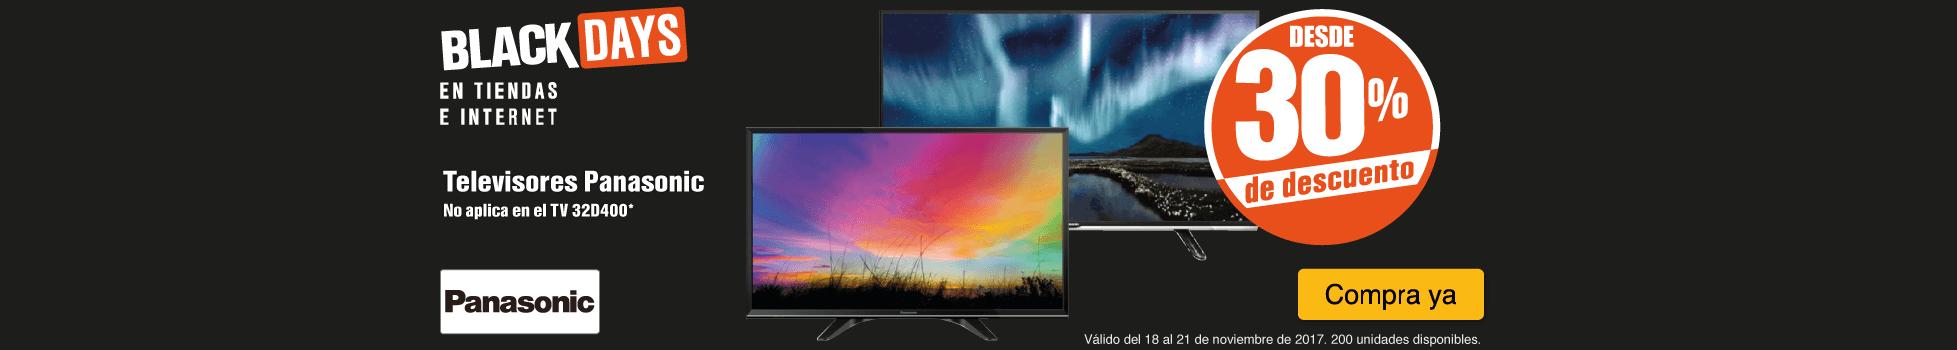 HIPER AK-1-TELEVISORES PANASONIC-TV-NOV18-21-BD